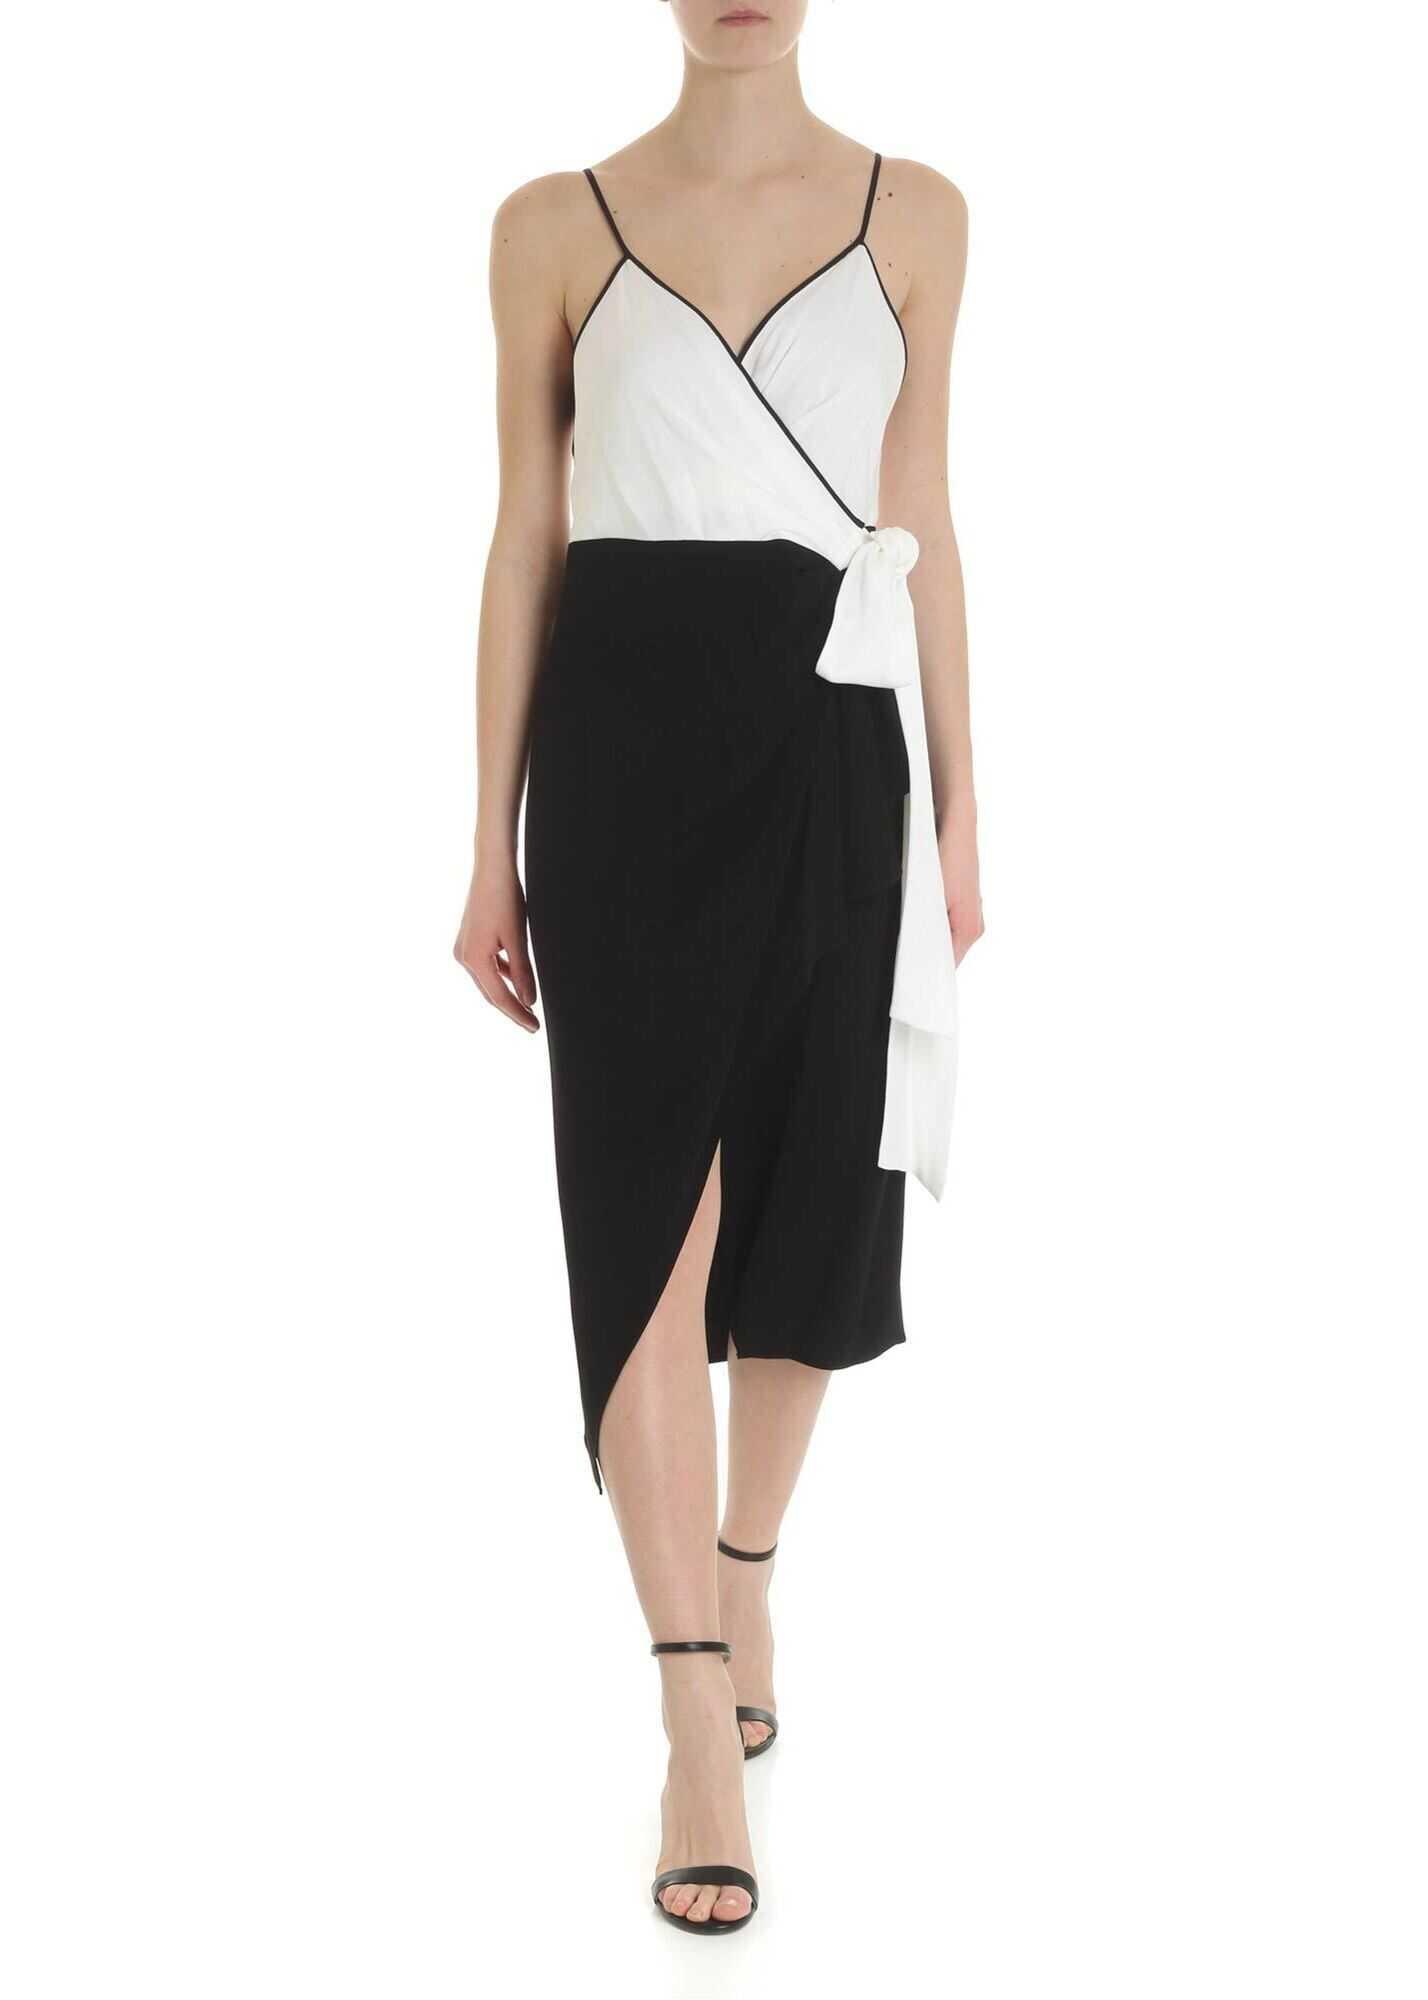 Diane von Furstenberg Avila Dvf Ivory And Black Dress Black